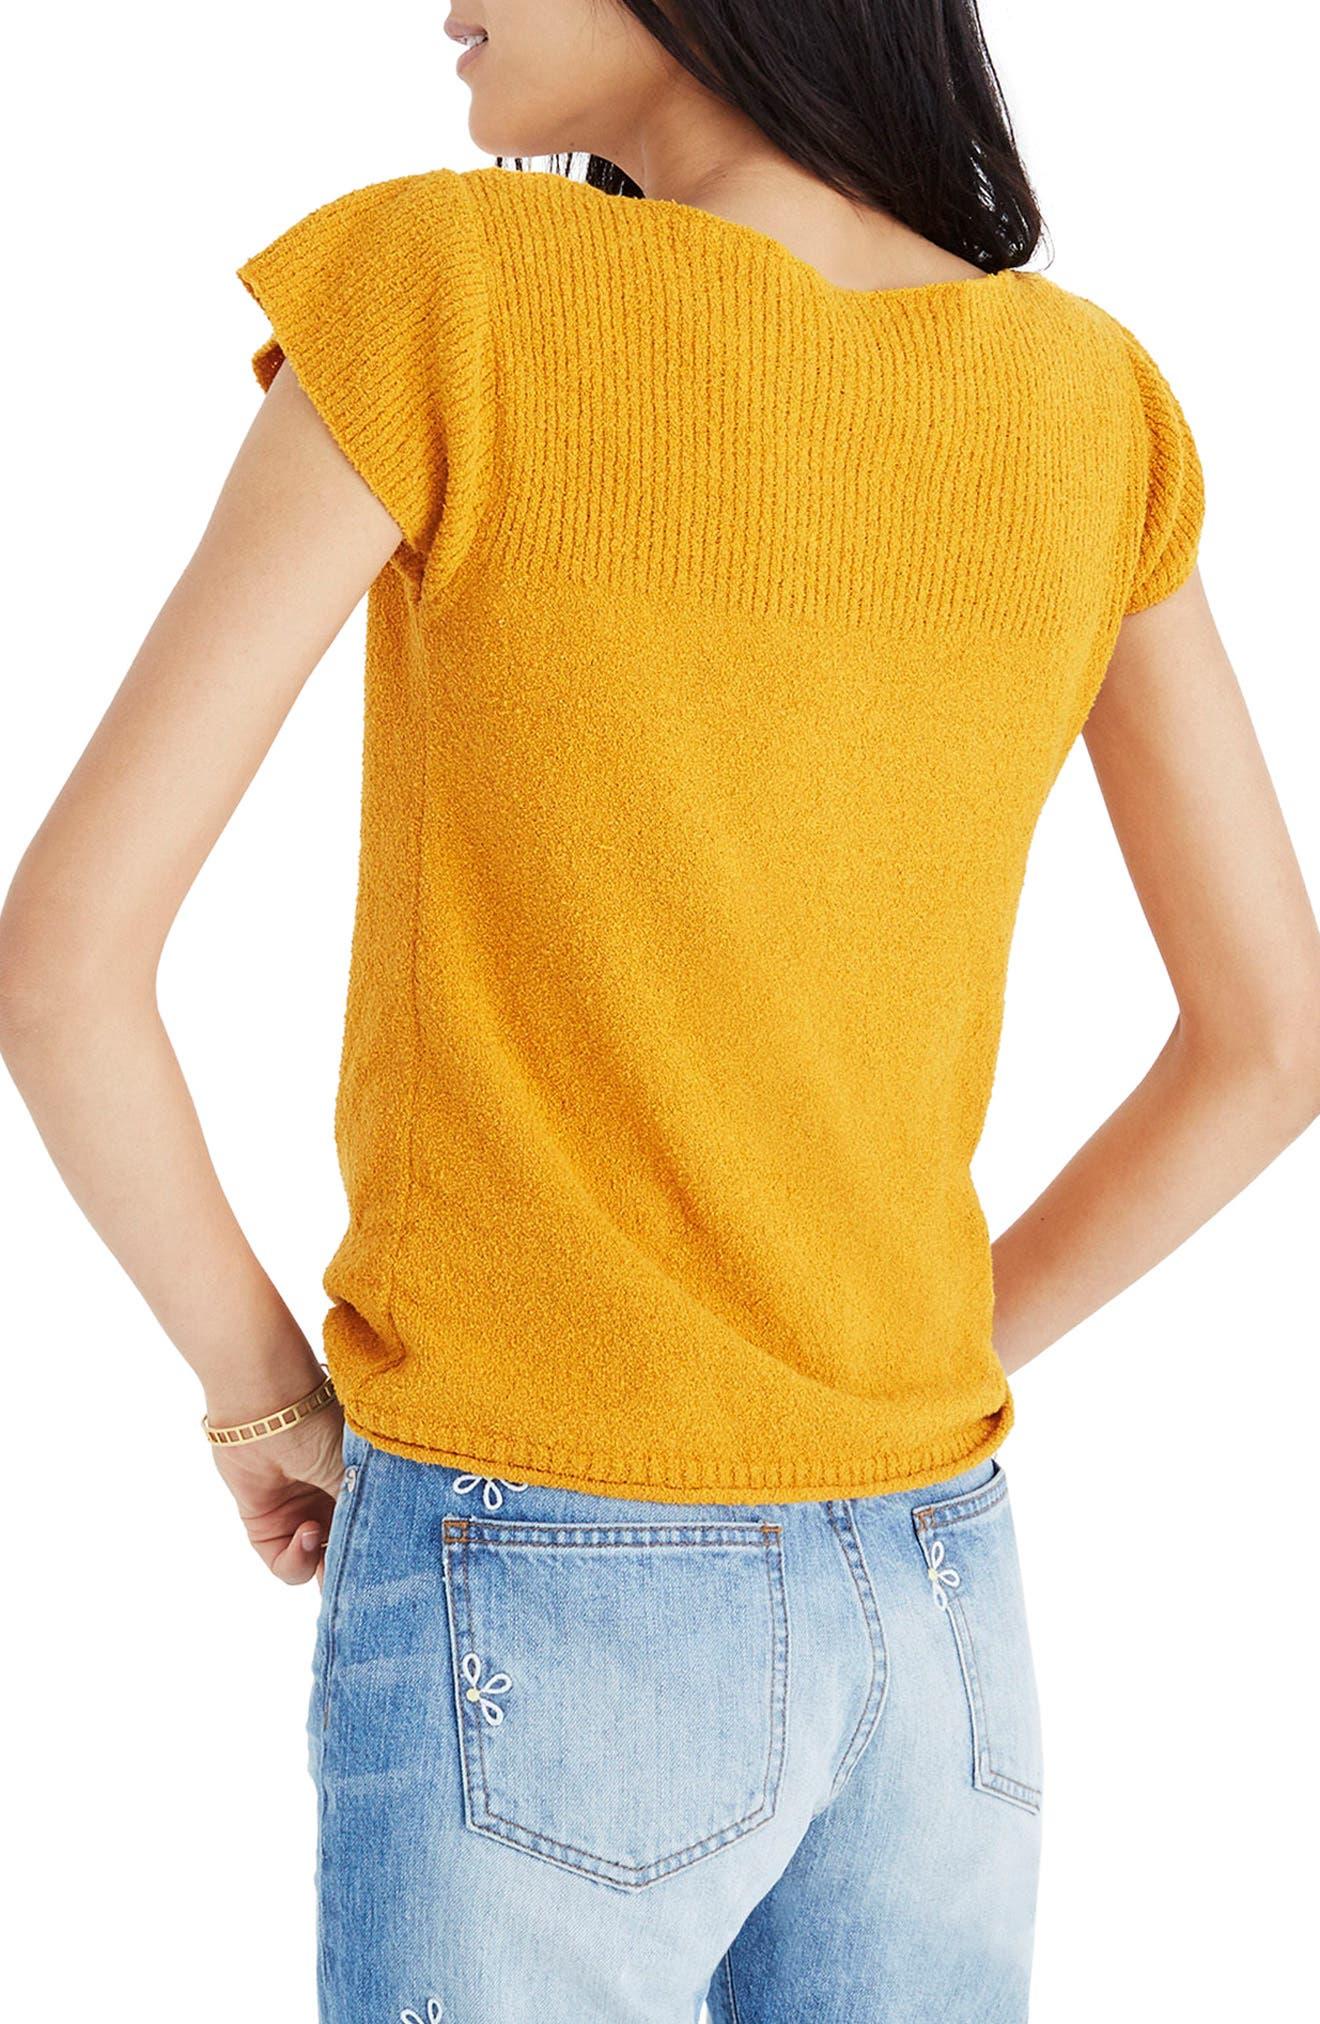 Marin Sweater Tee,                             Alternate thumbnail 2, color,                             700